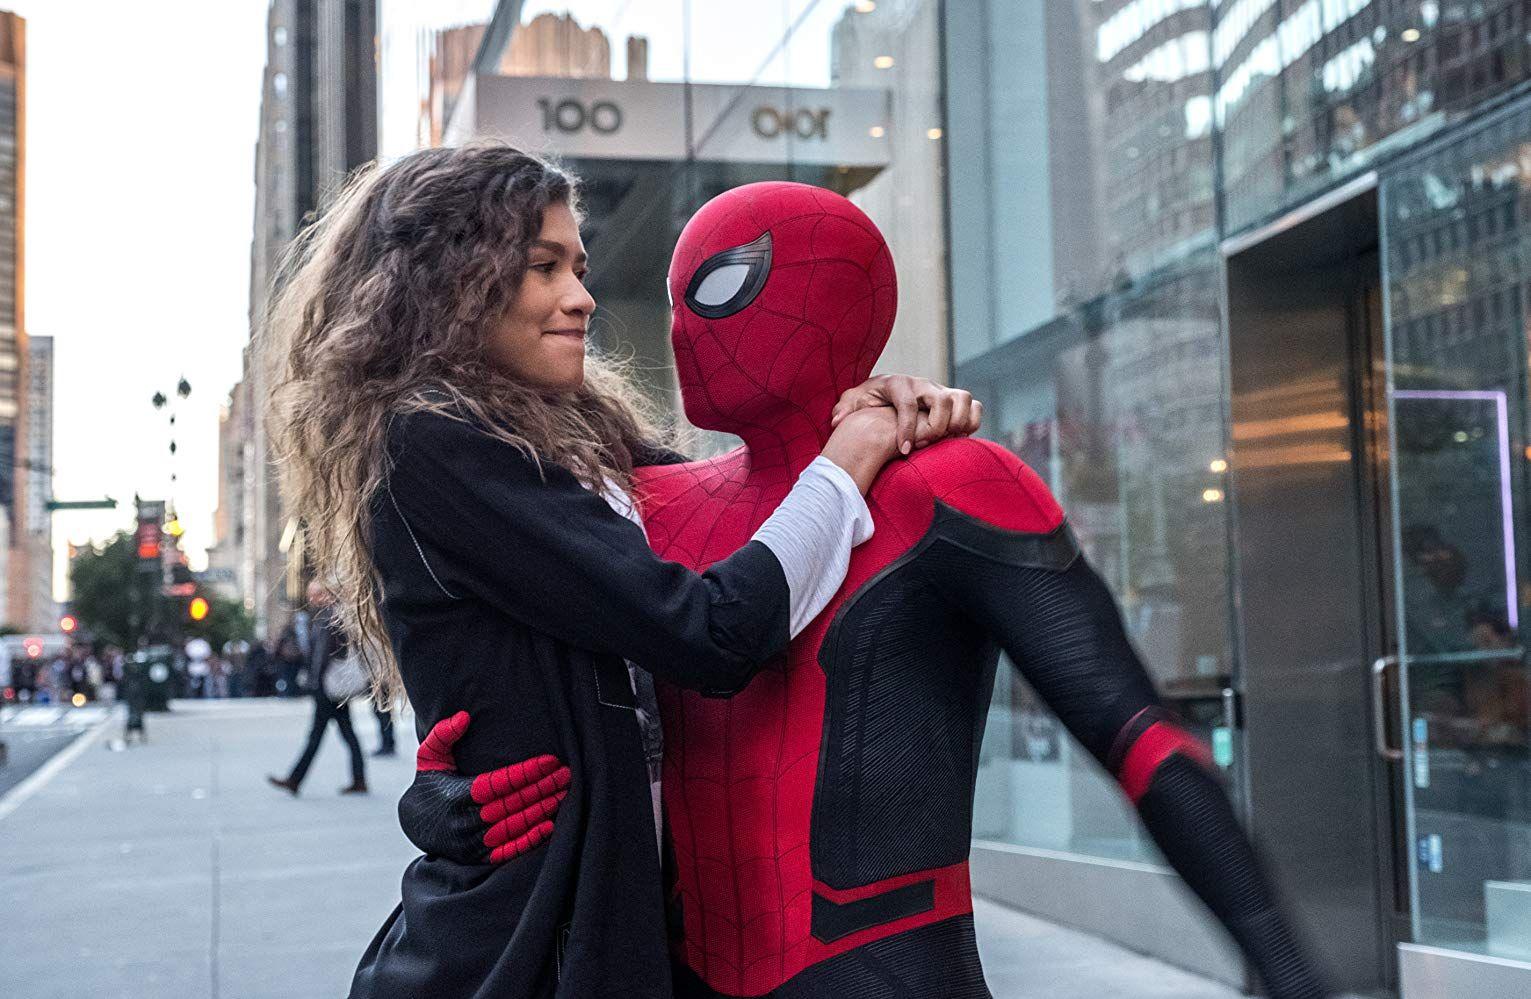 Free Watch Spider Man Far From Home Full Online 2019 Movie Nick Fury Jake Gyllenhaal Orumcek Adam